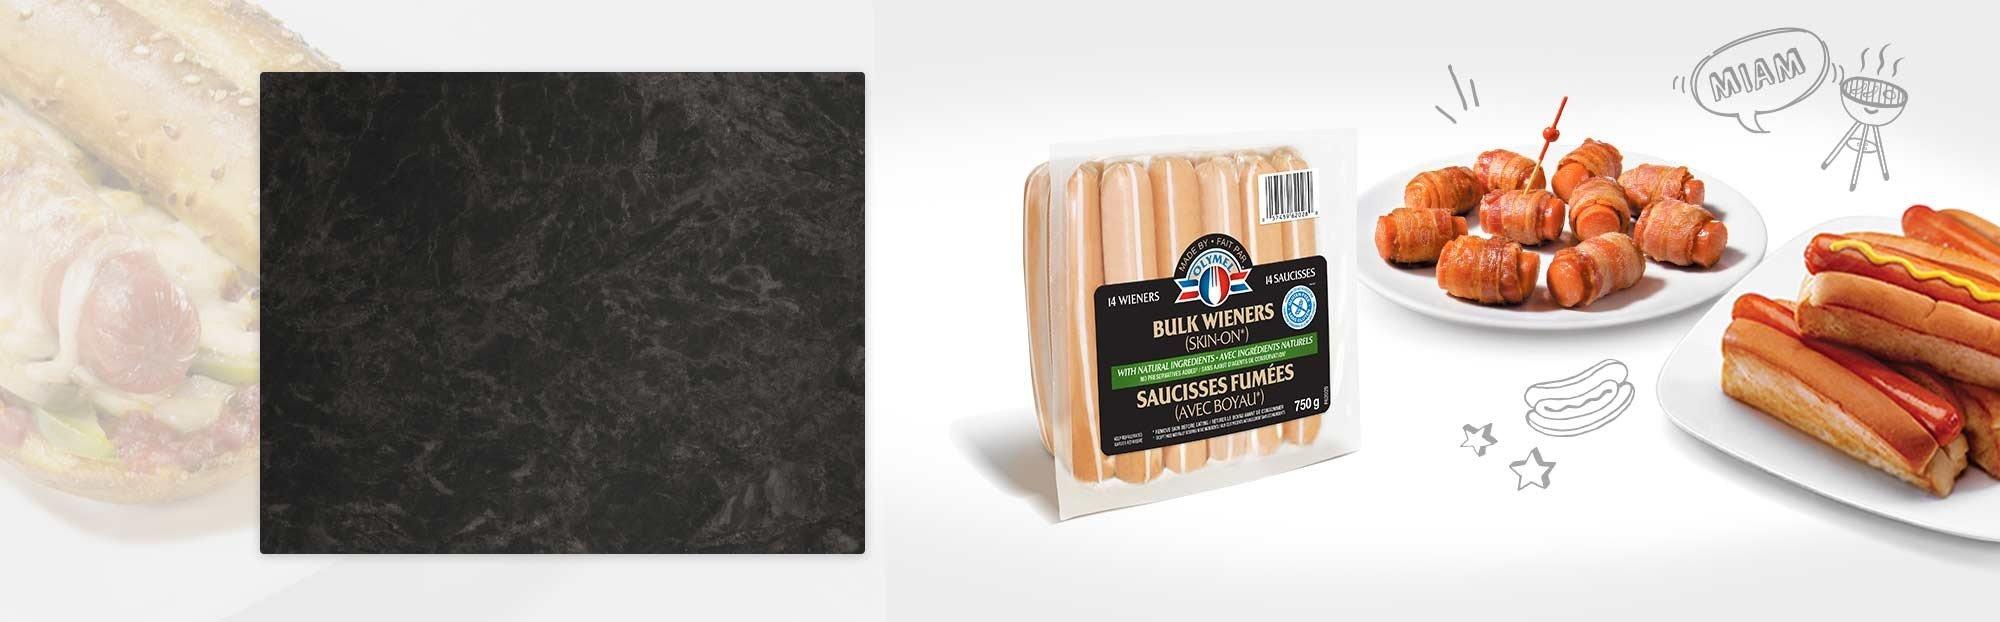 Bulk wieners with natural ingredients (Skin on)